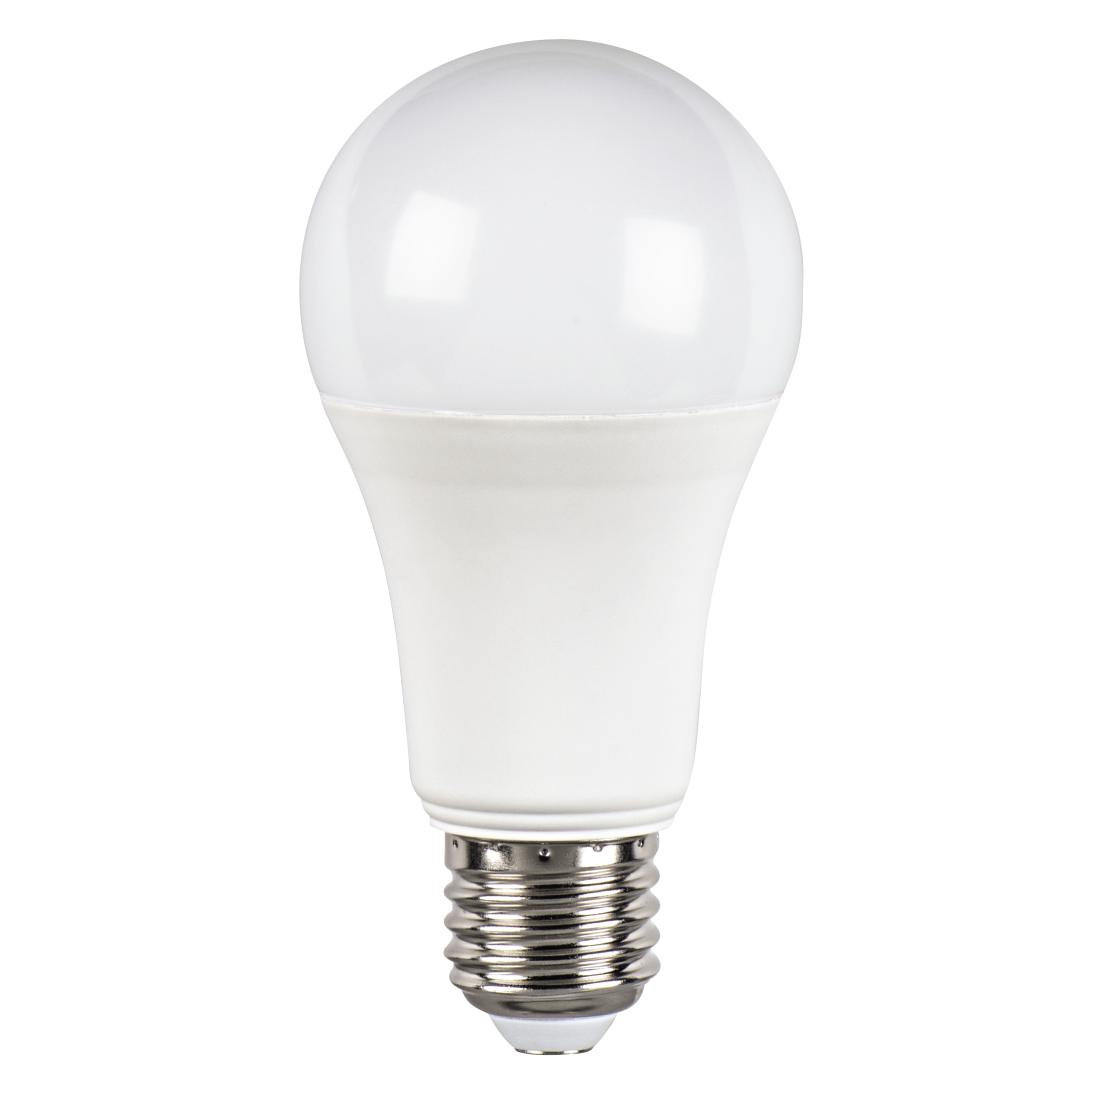 xavax.eu | 00112500 Xavax LED-Lampe, E27, 1580lm ersetzt 103W ...